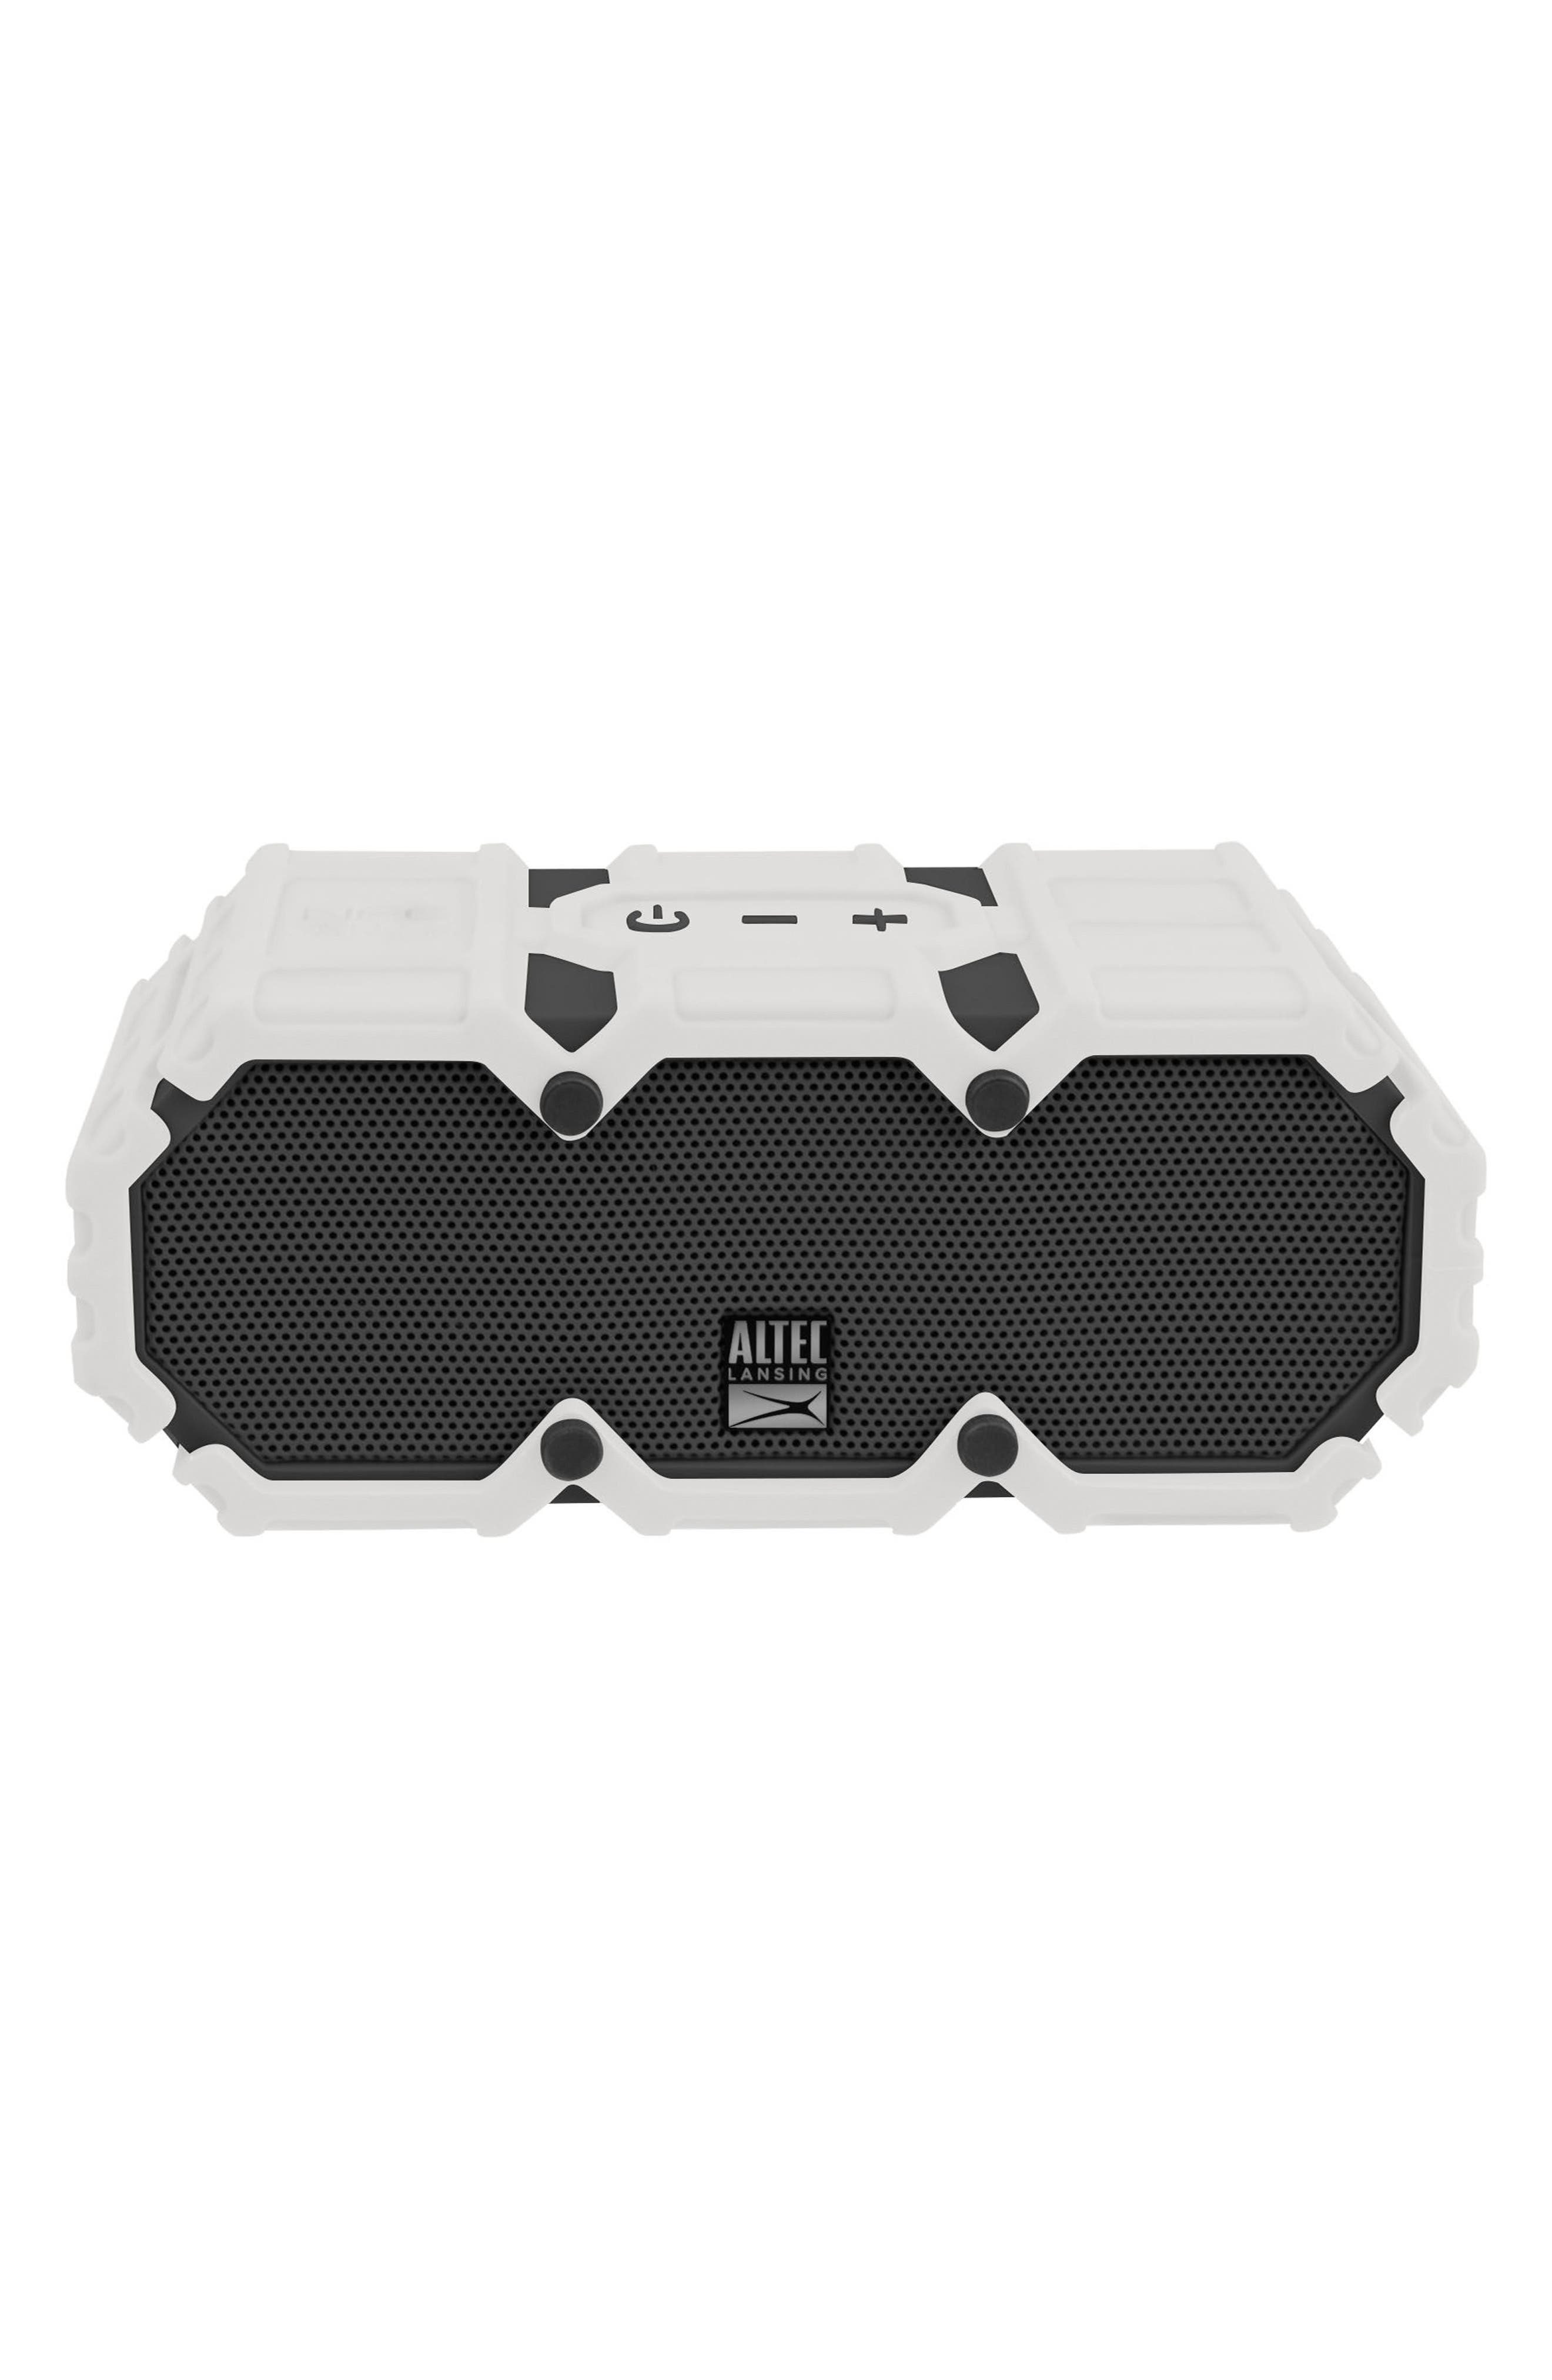 Mini Lifejacket S3 Waterproof Wireless Speaker,                             Main thumbnail 1, color,                             WHITE/ GRAPHITE